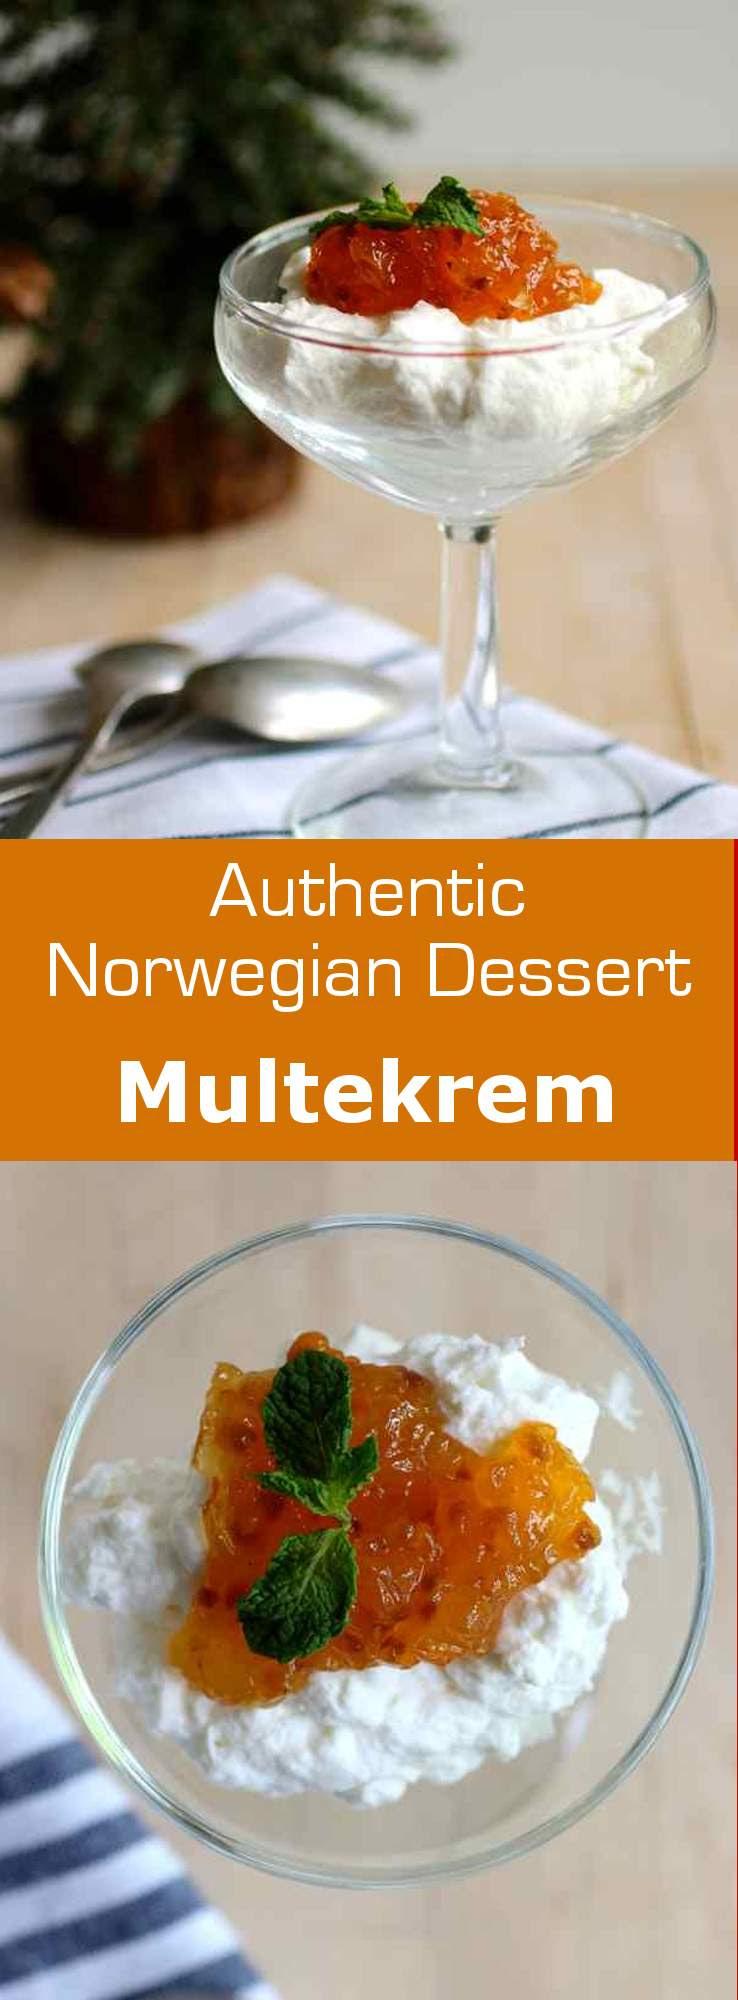 Multekrem - Traditional Norwegian Recipe   196 flavors